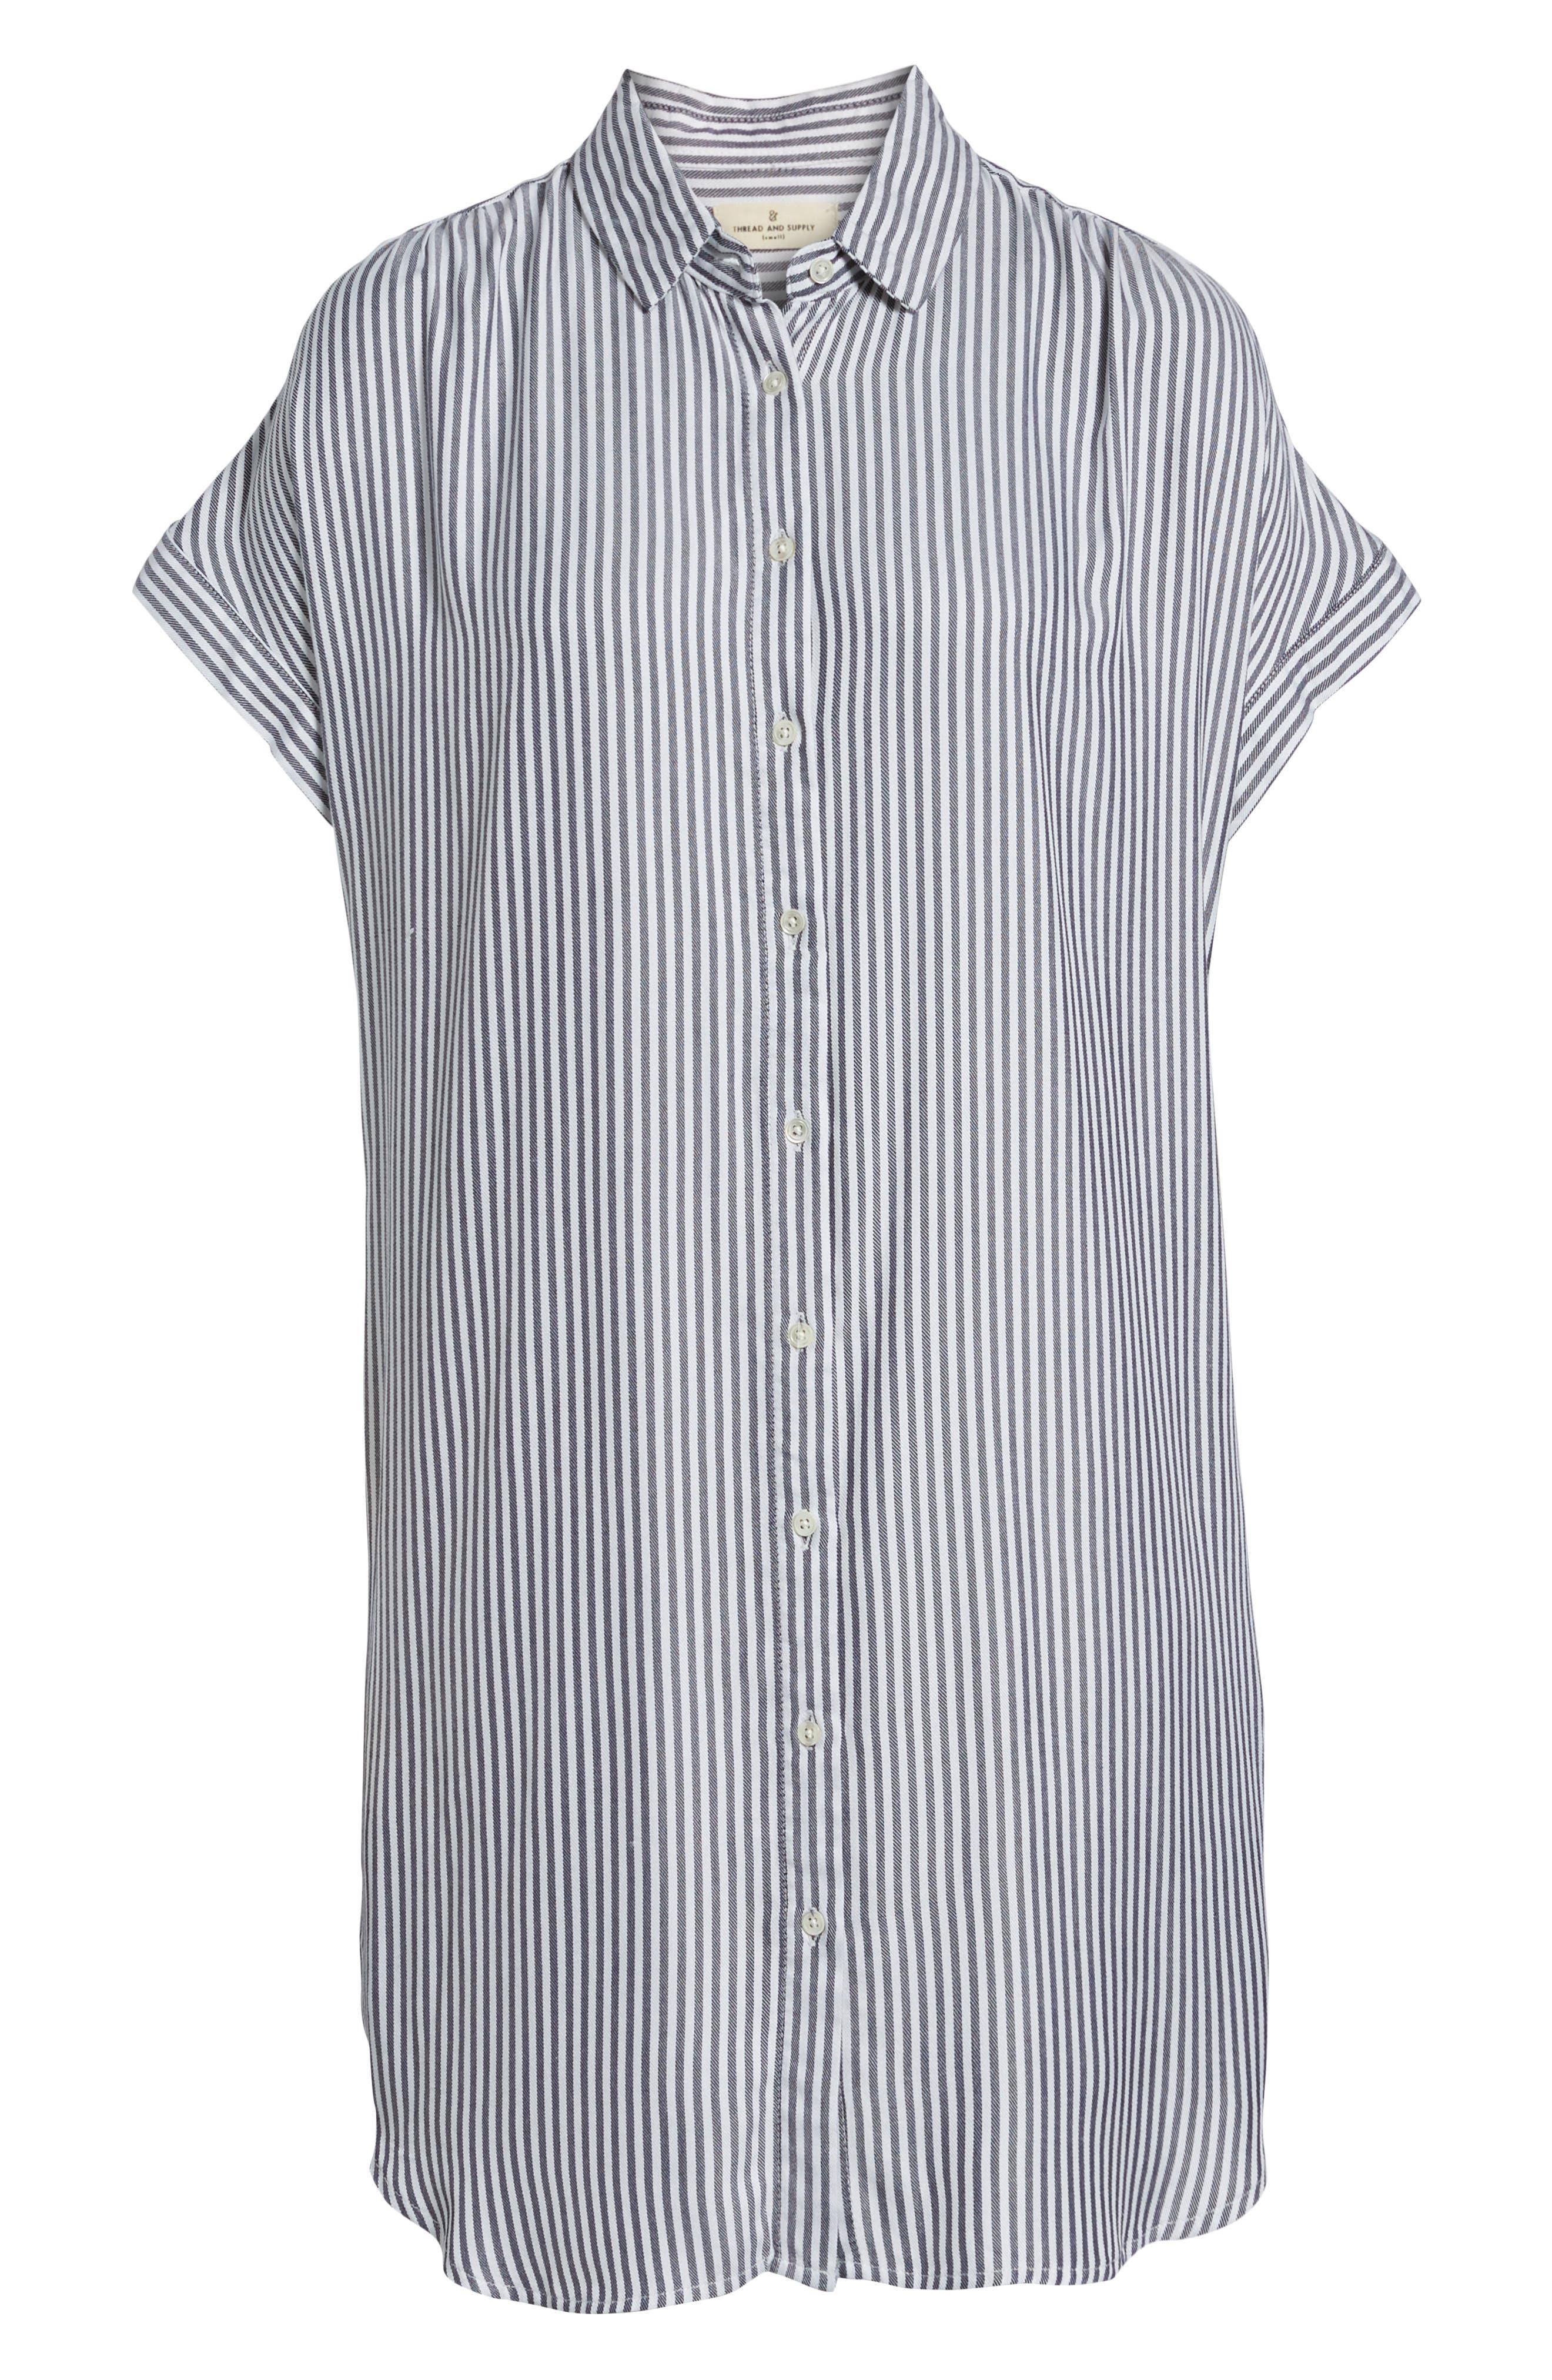 Skipper Stripe Shirtdress,                             Alternate thumbnail 6, color,                             Navy White